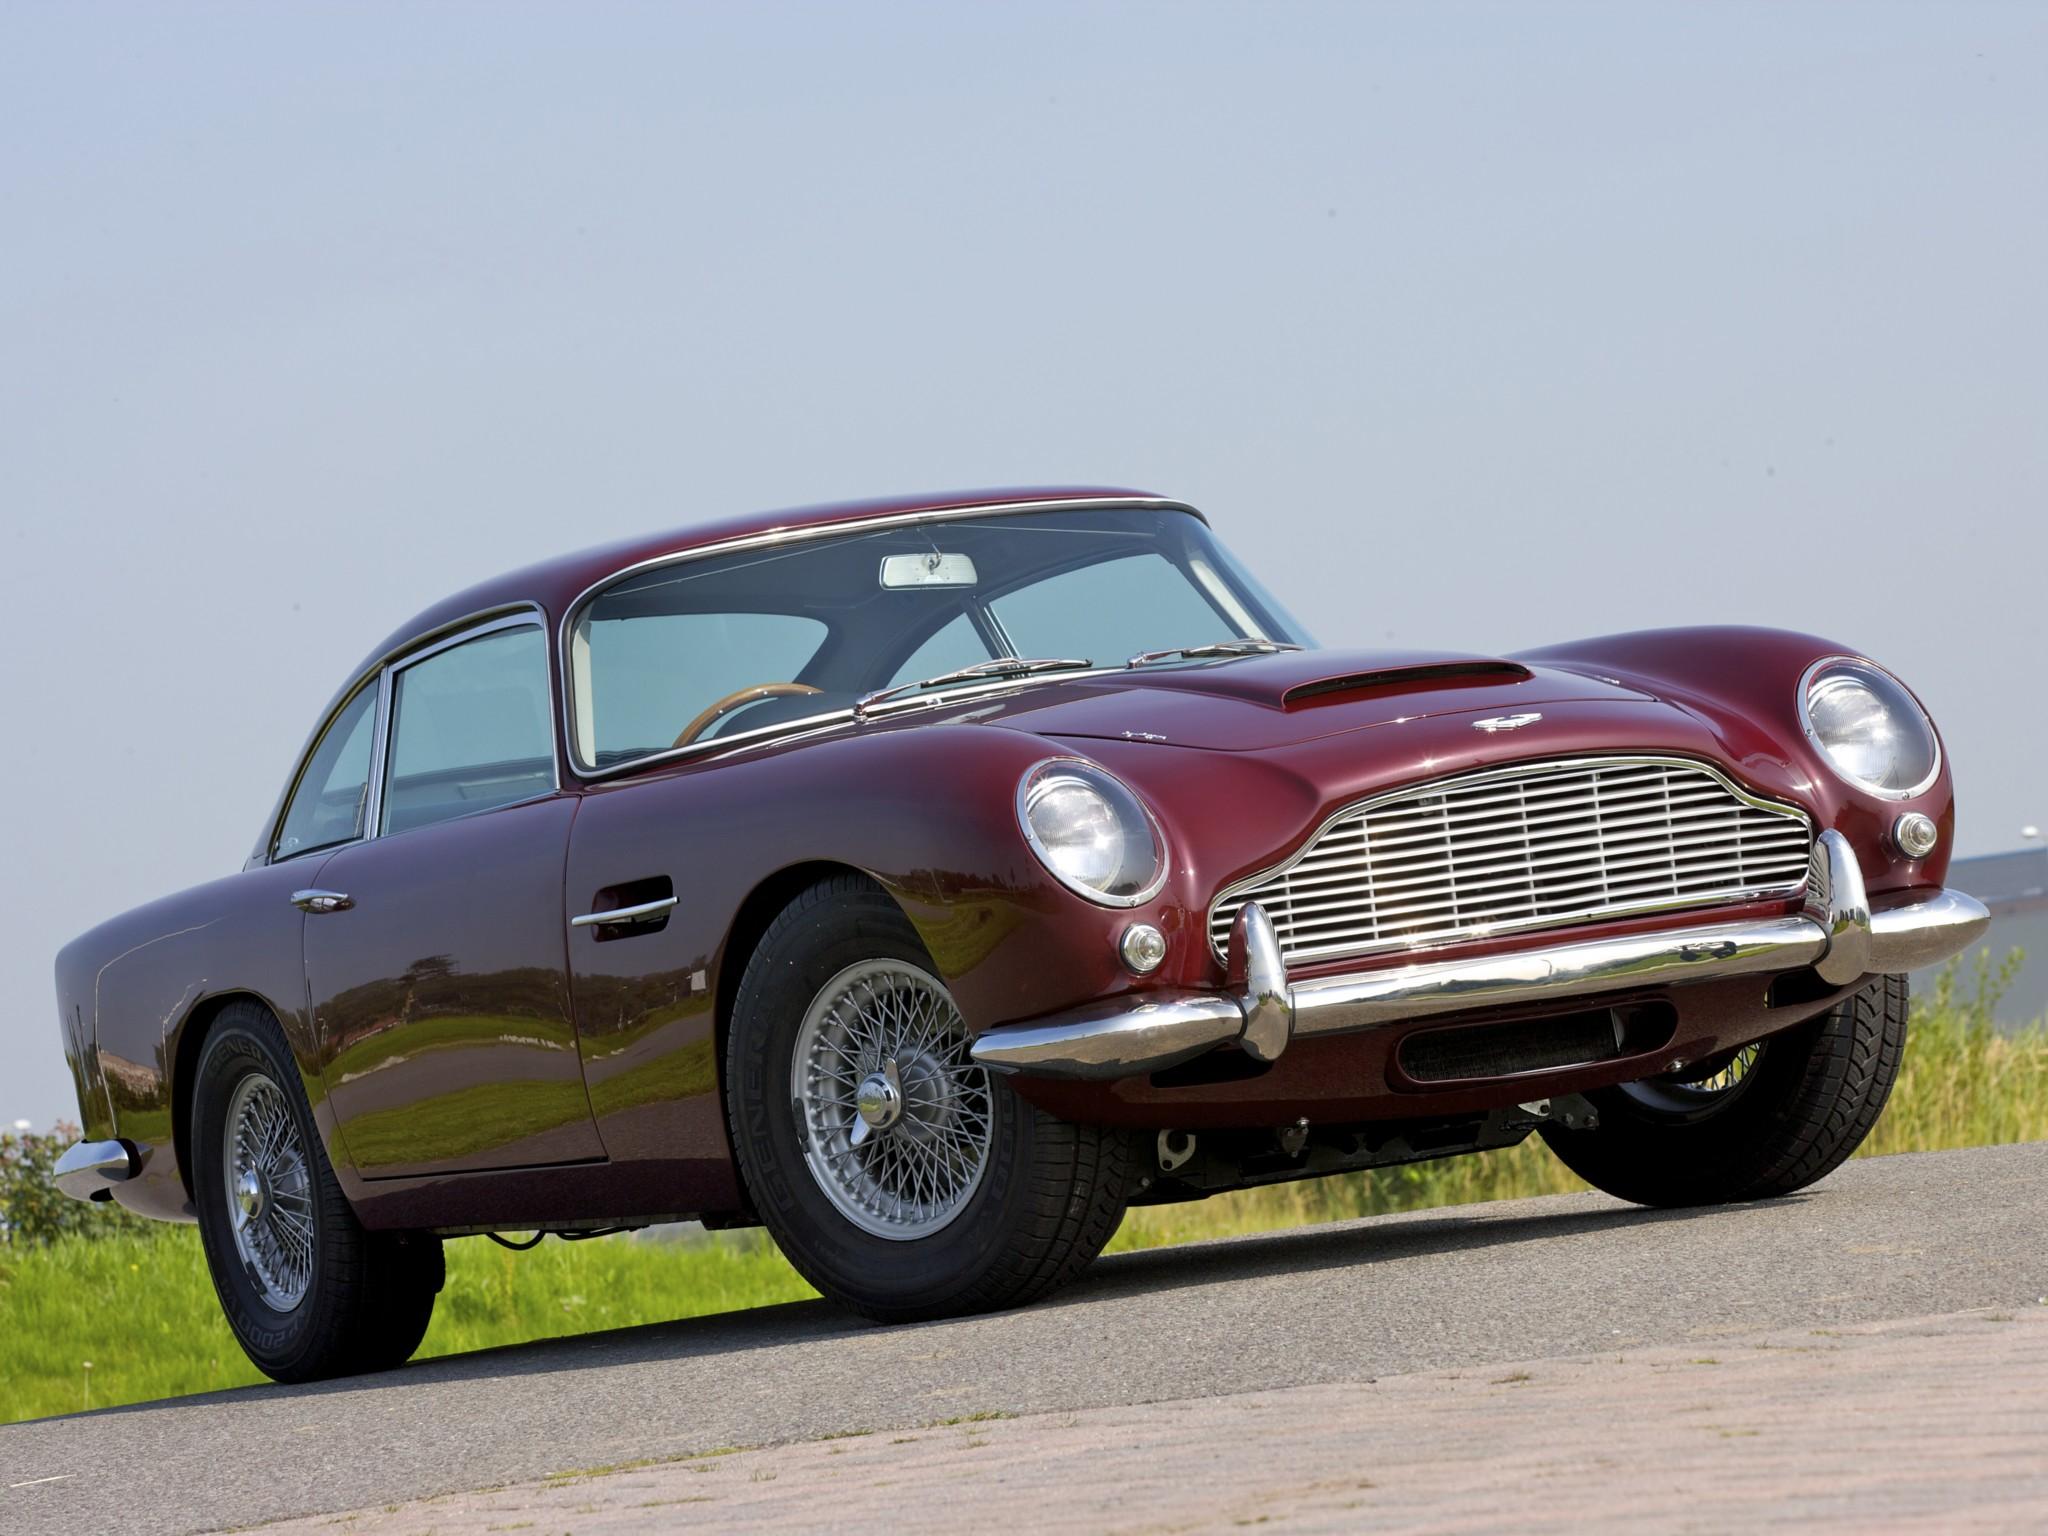 Aston Martin DB5 UK spec Wallpapers Car wallpapers HD 2048x1536